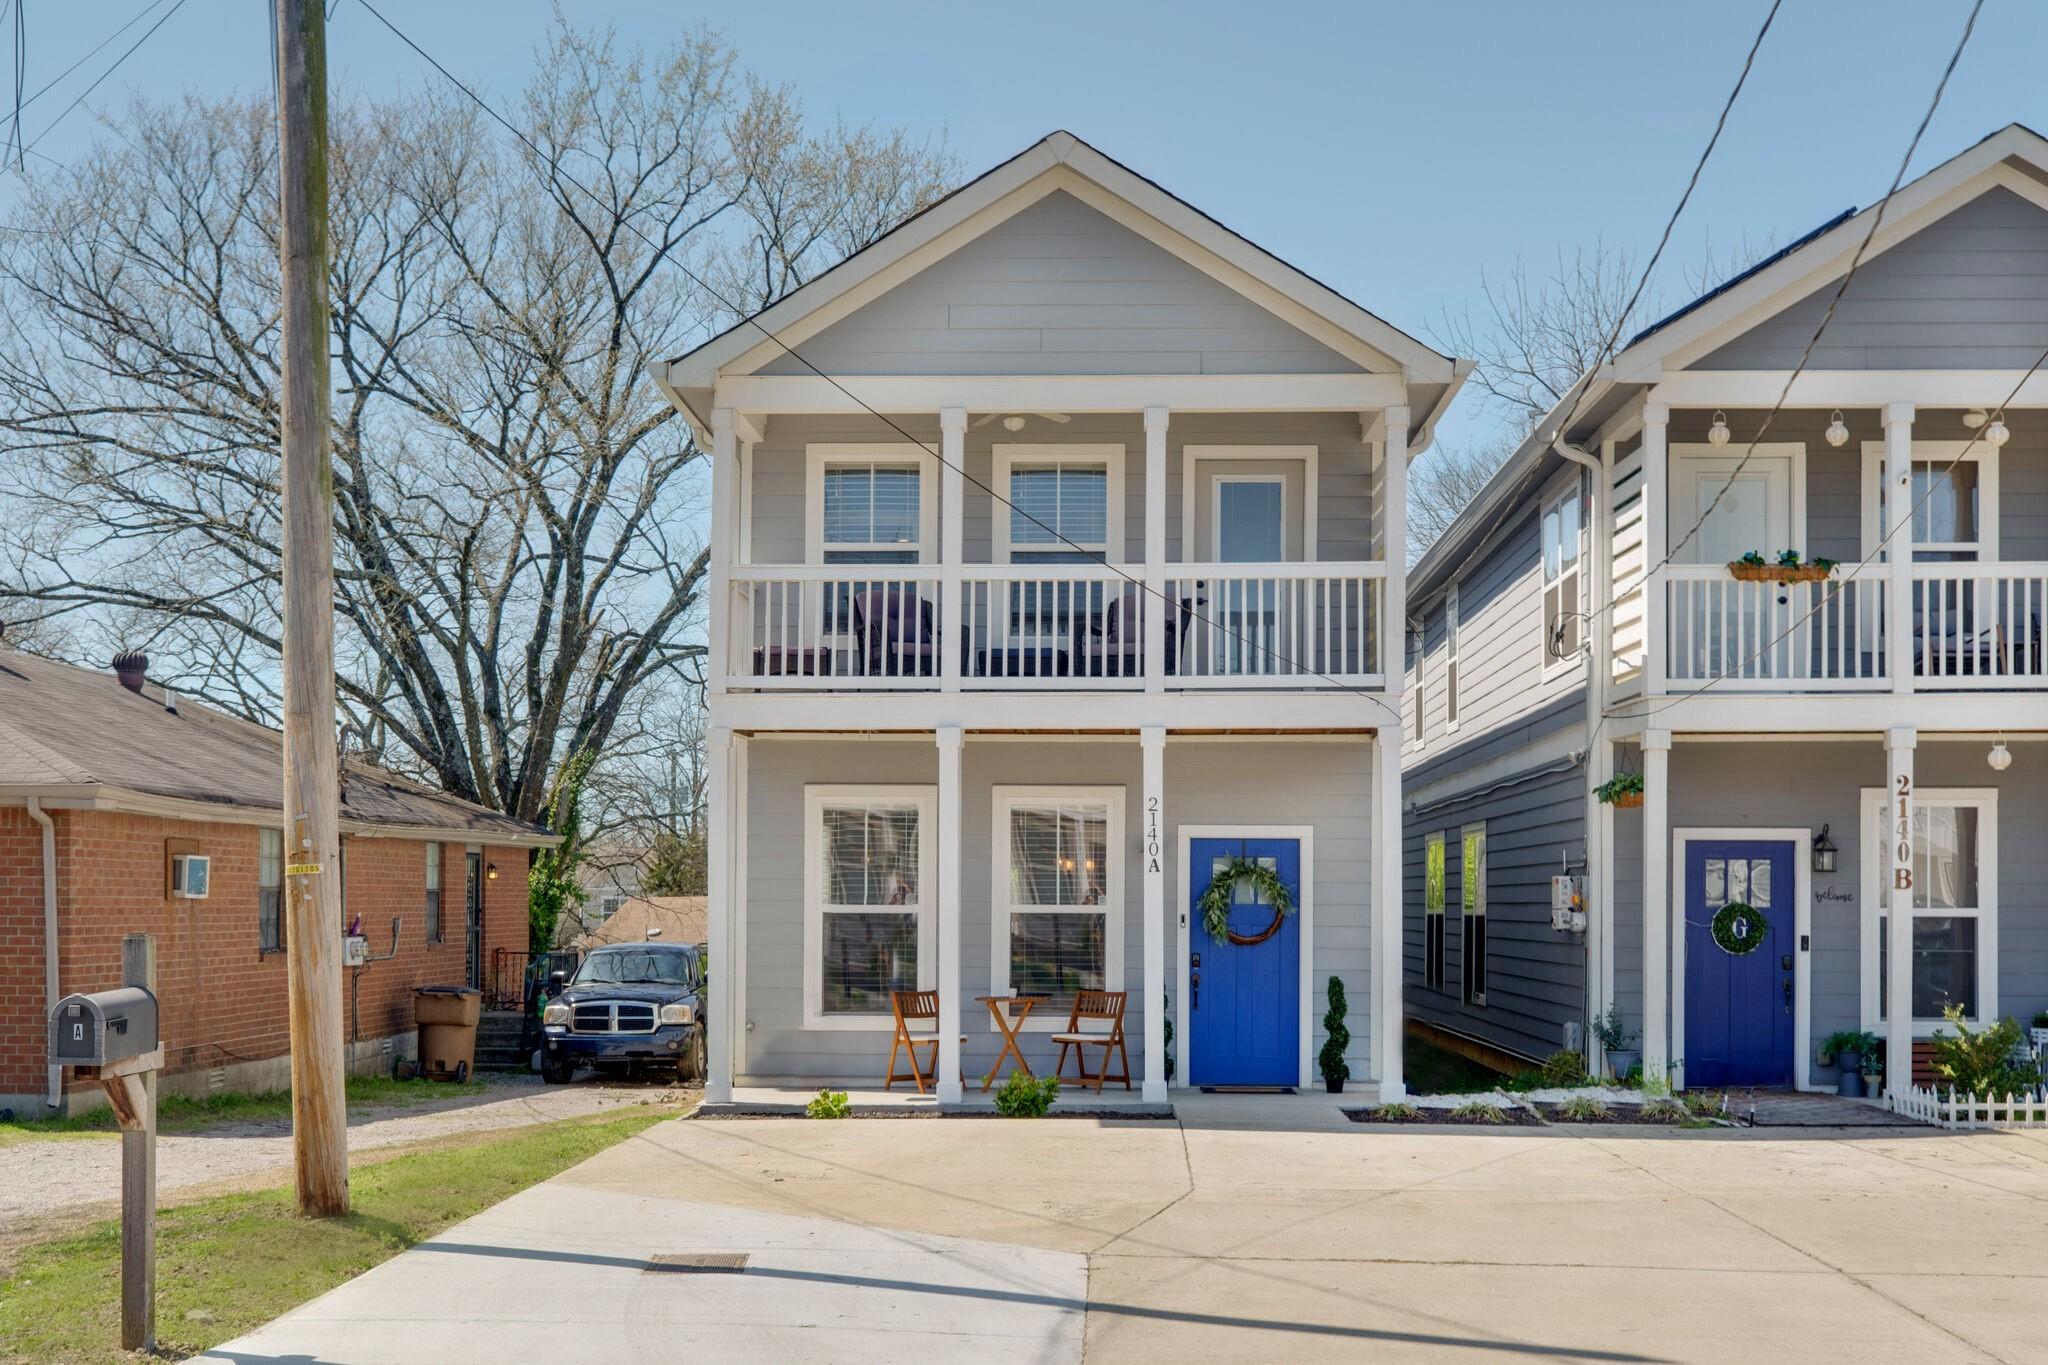 2140A Burns St Property Photo - Nashville, TN real estate listing